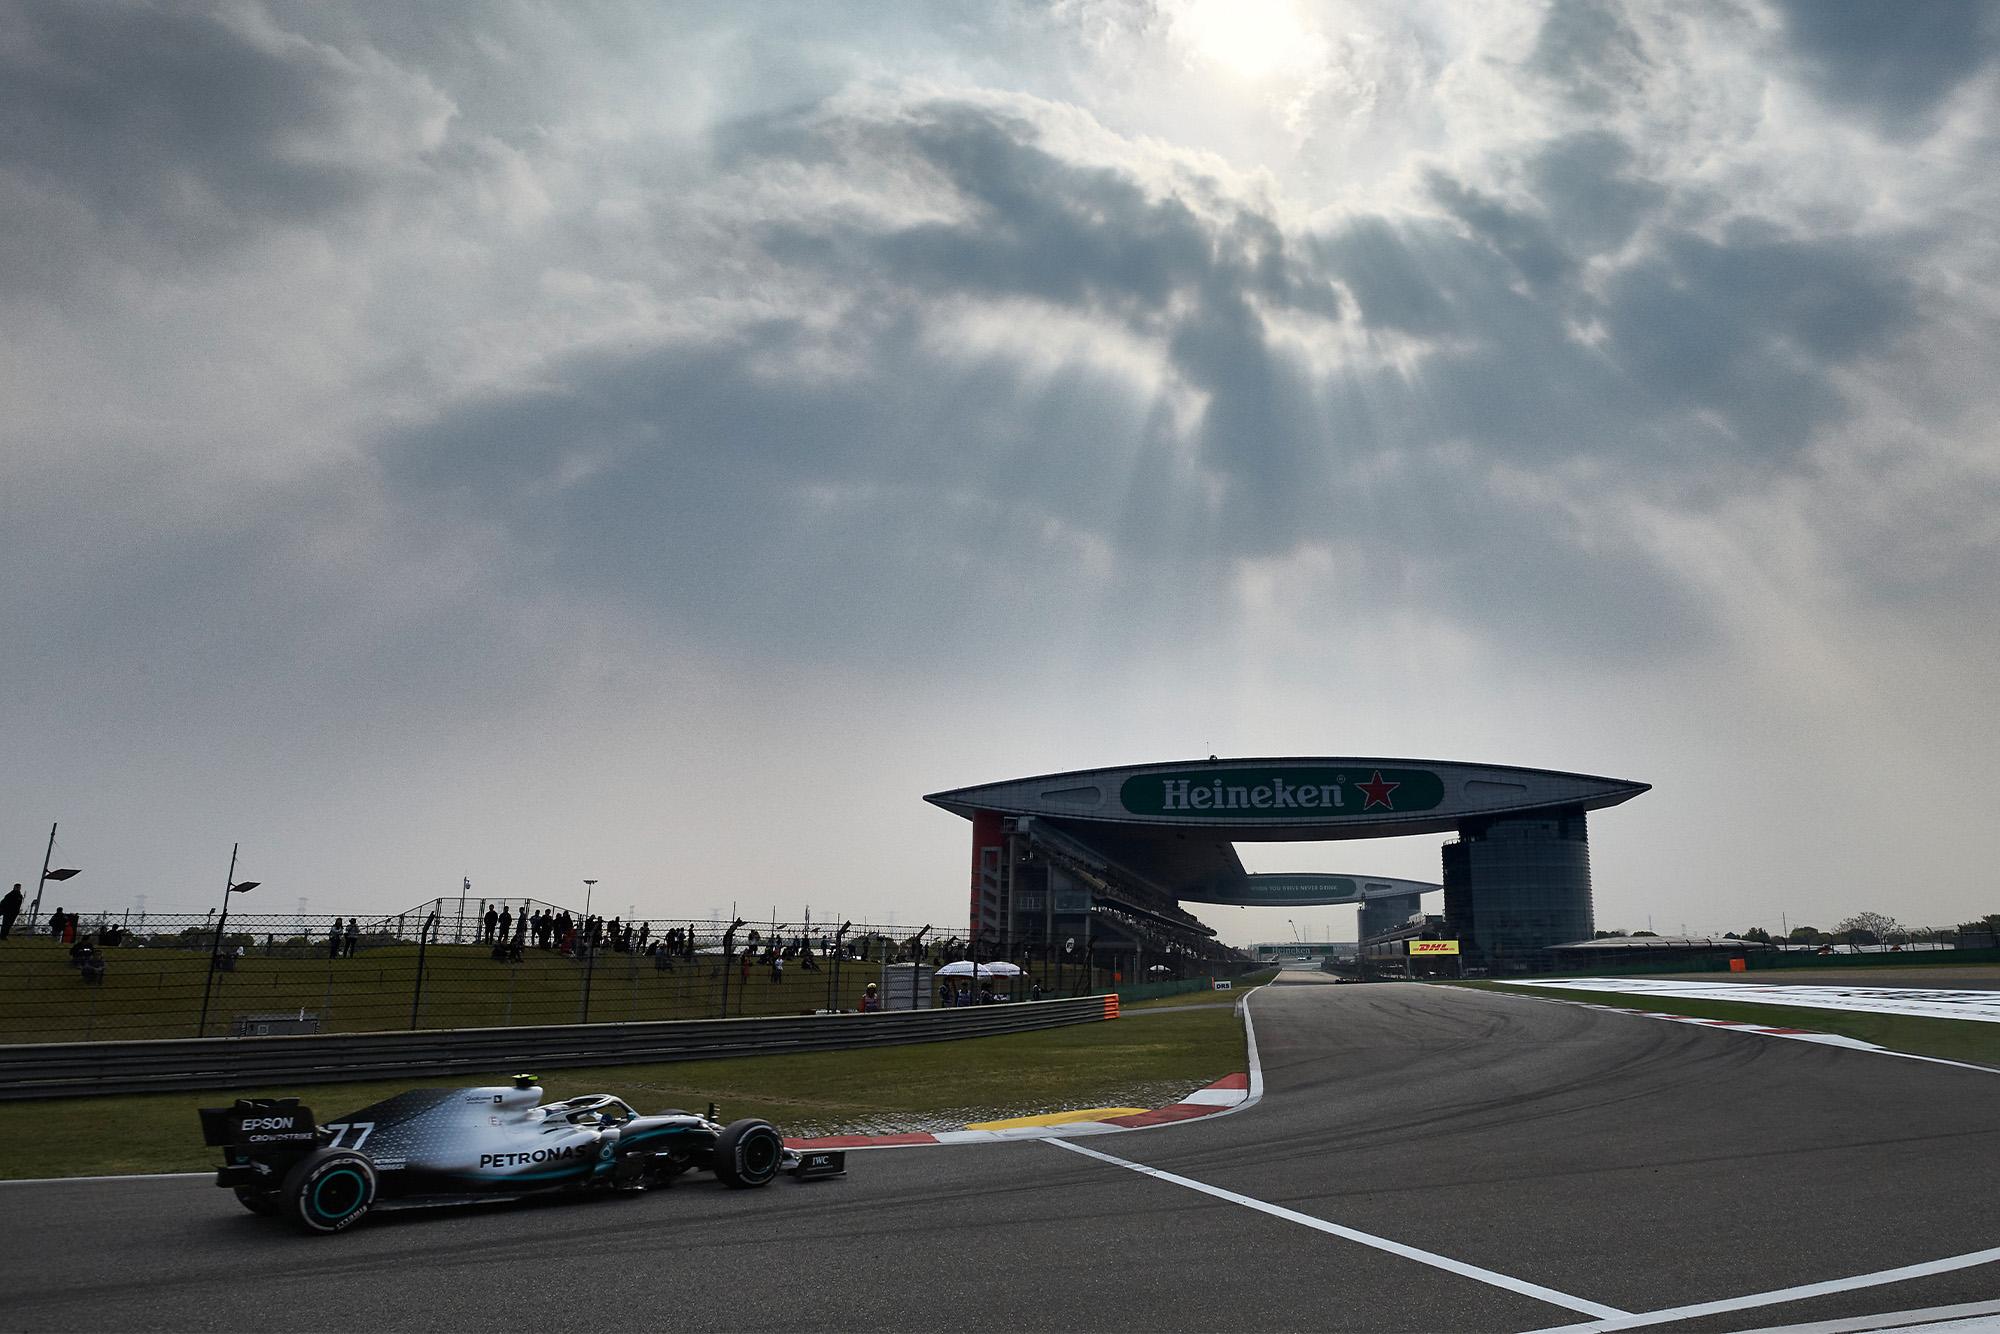 Sanya ePrix cancelled as FIA monitors coronavirus situation ahead of Chinese Grand Prix